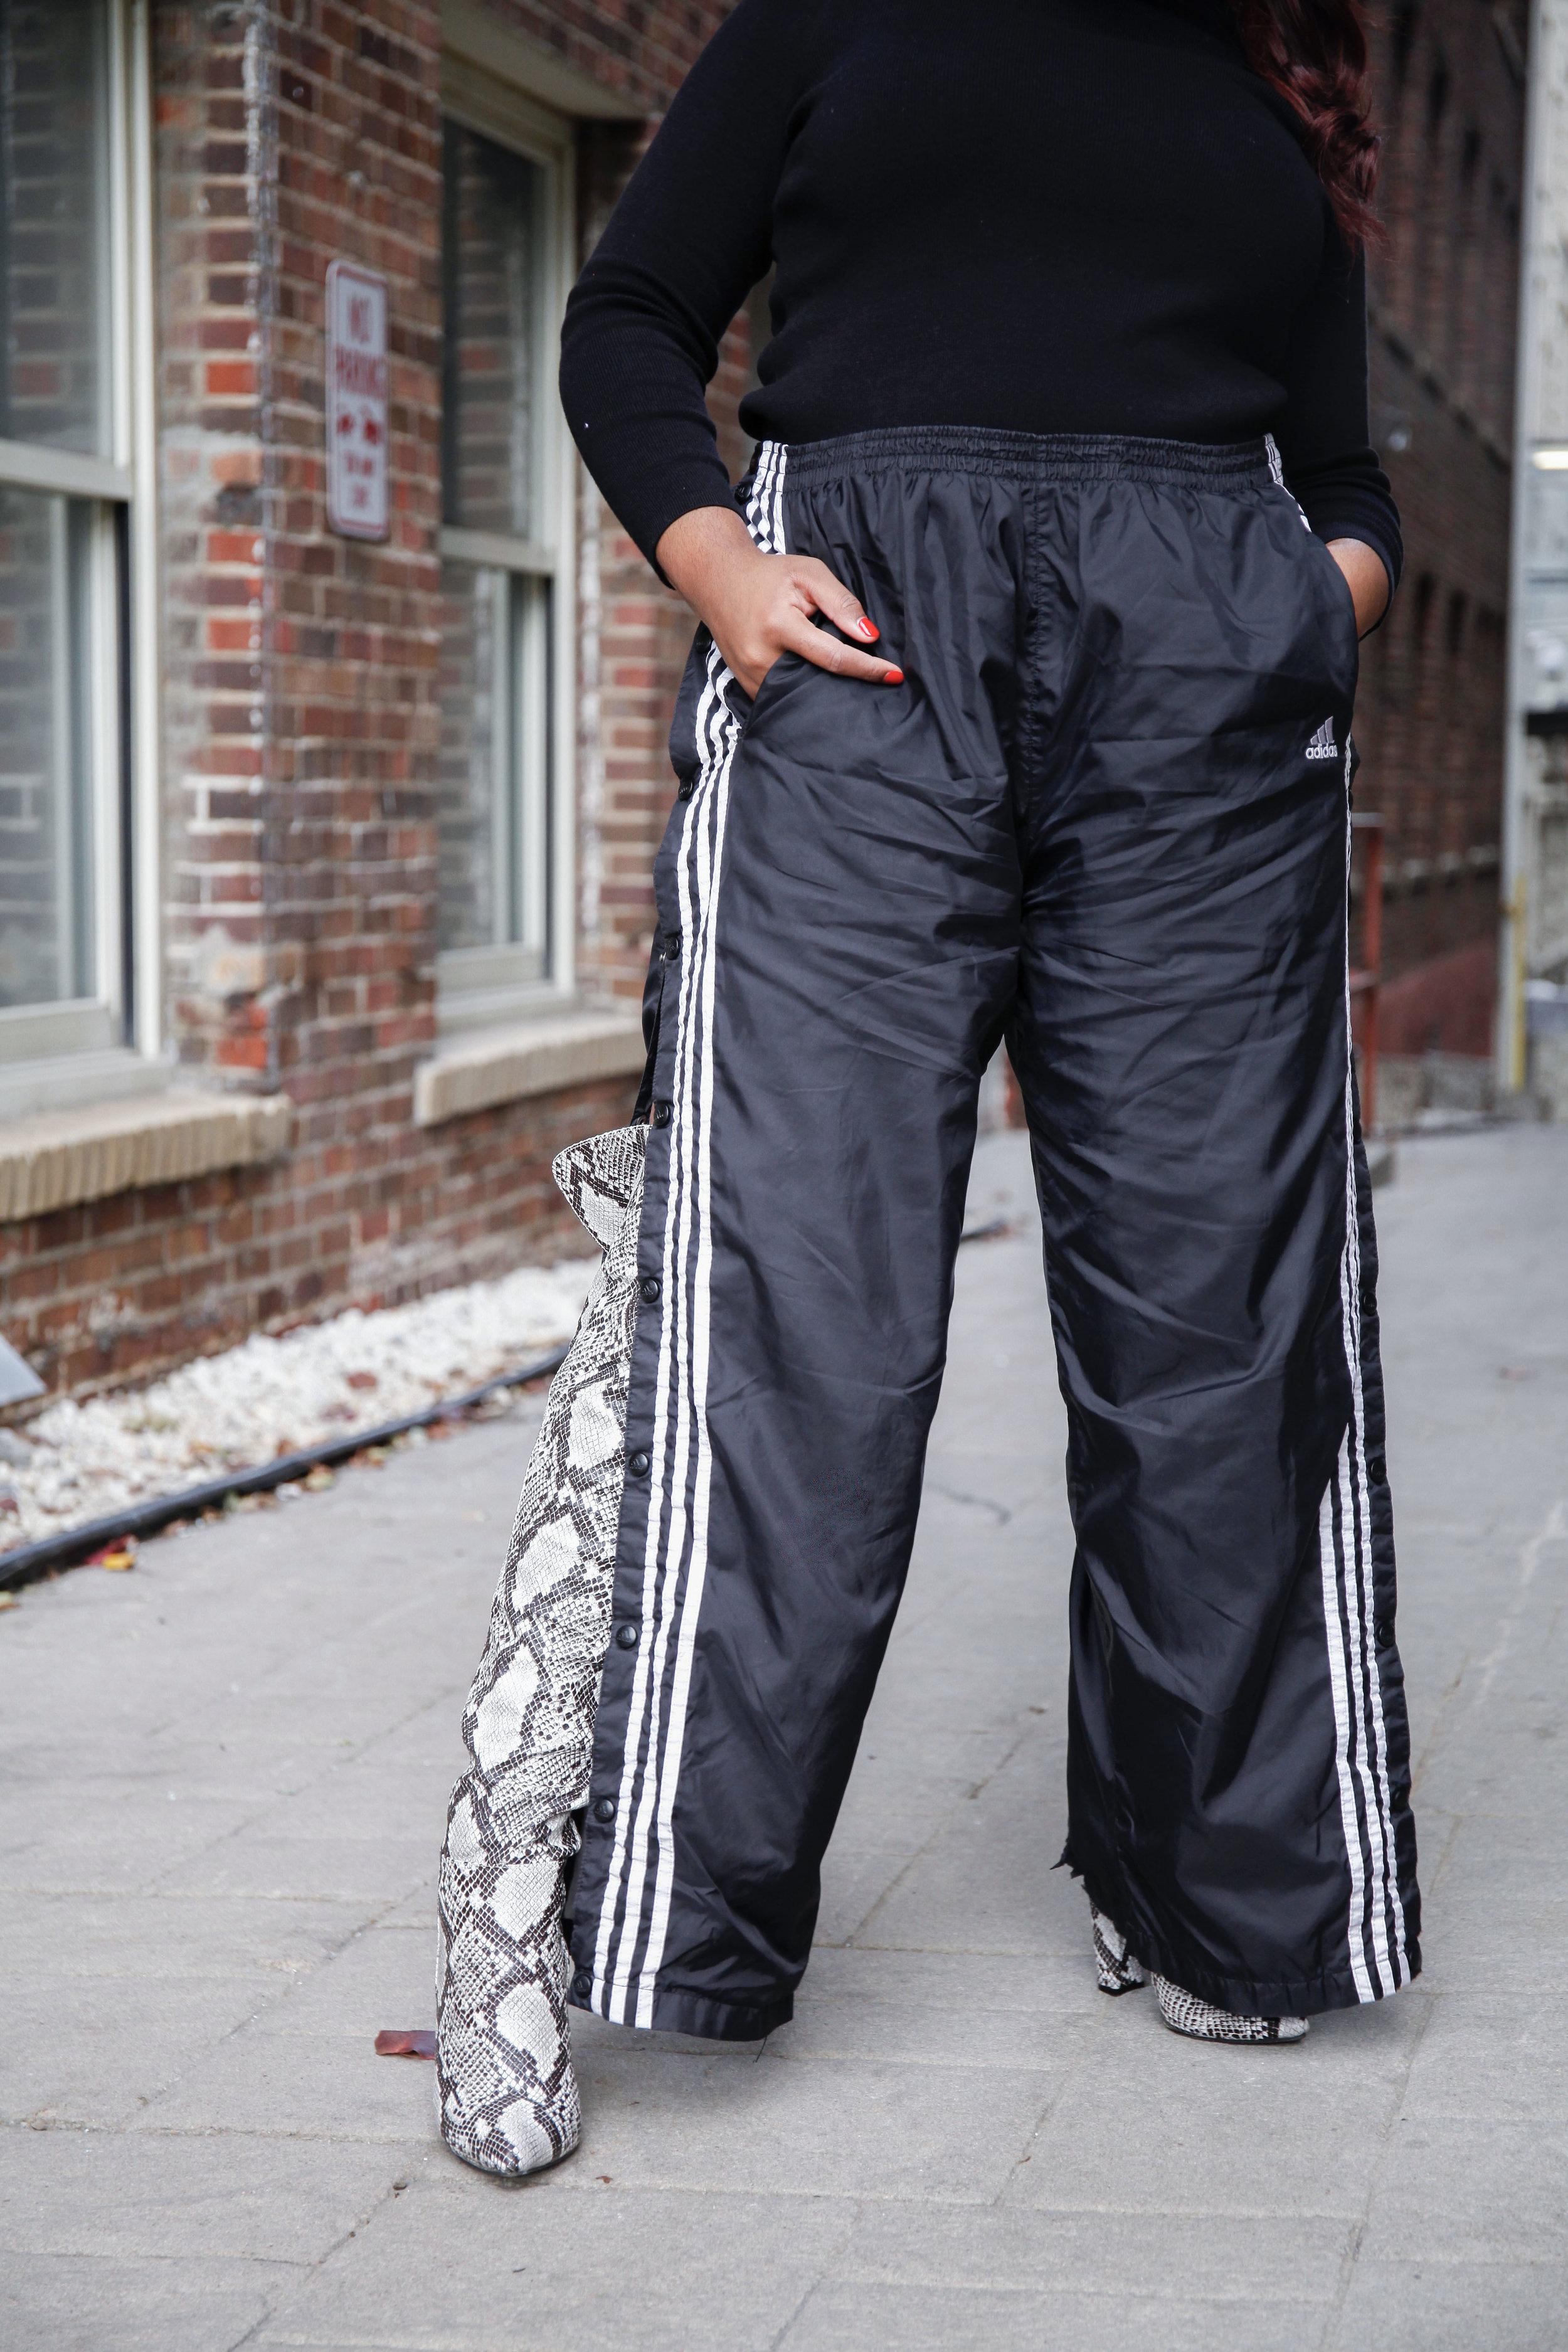 retro adidas track pants on jasmine diane shot by steven g.jpg